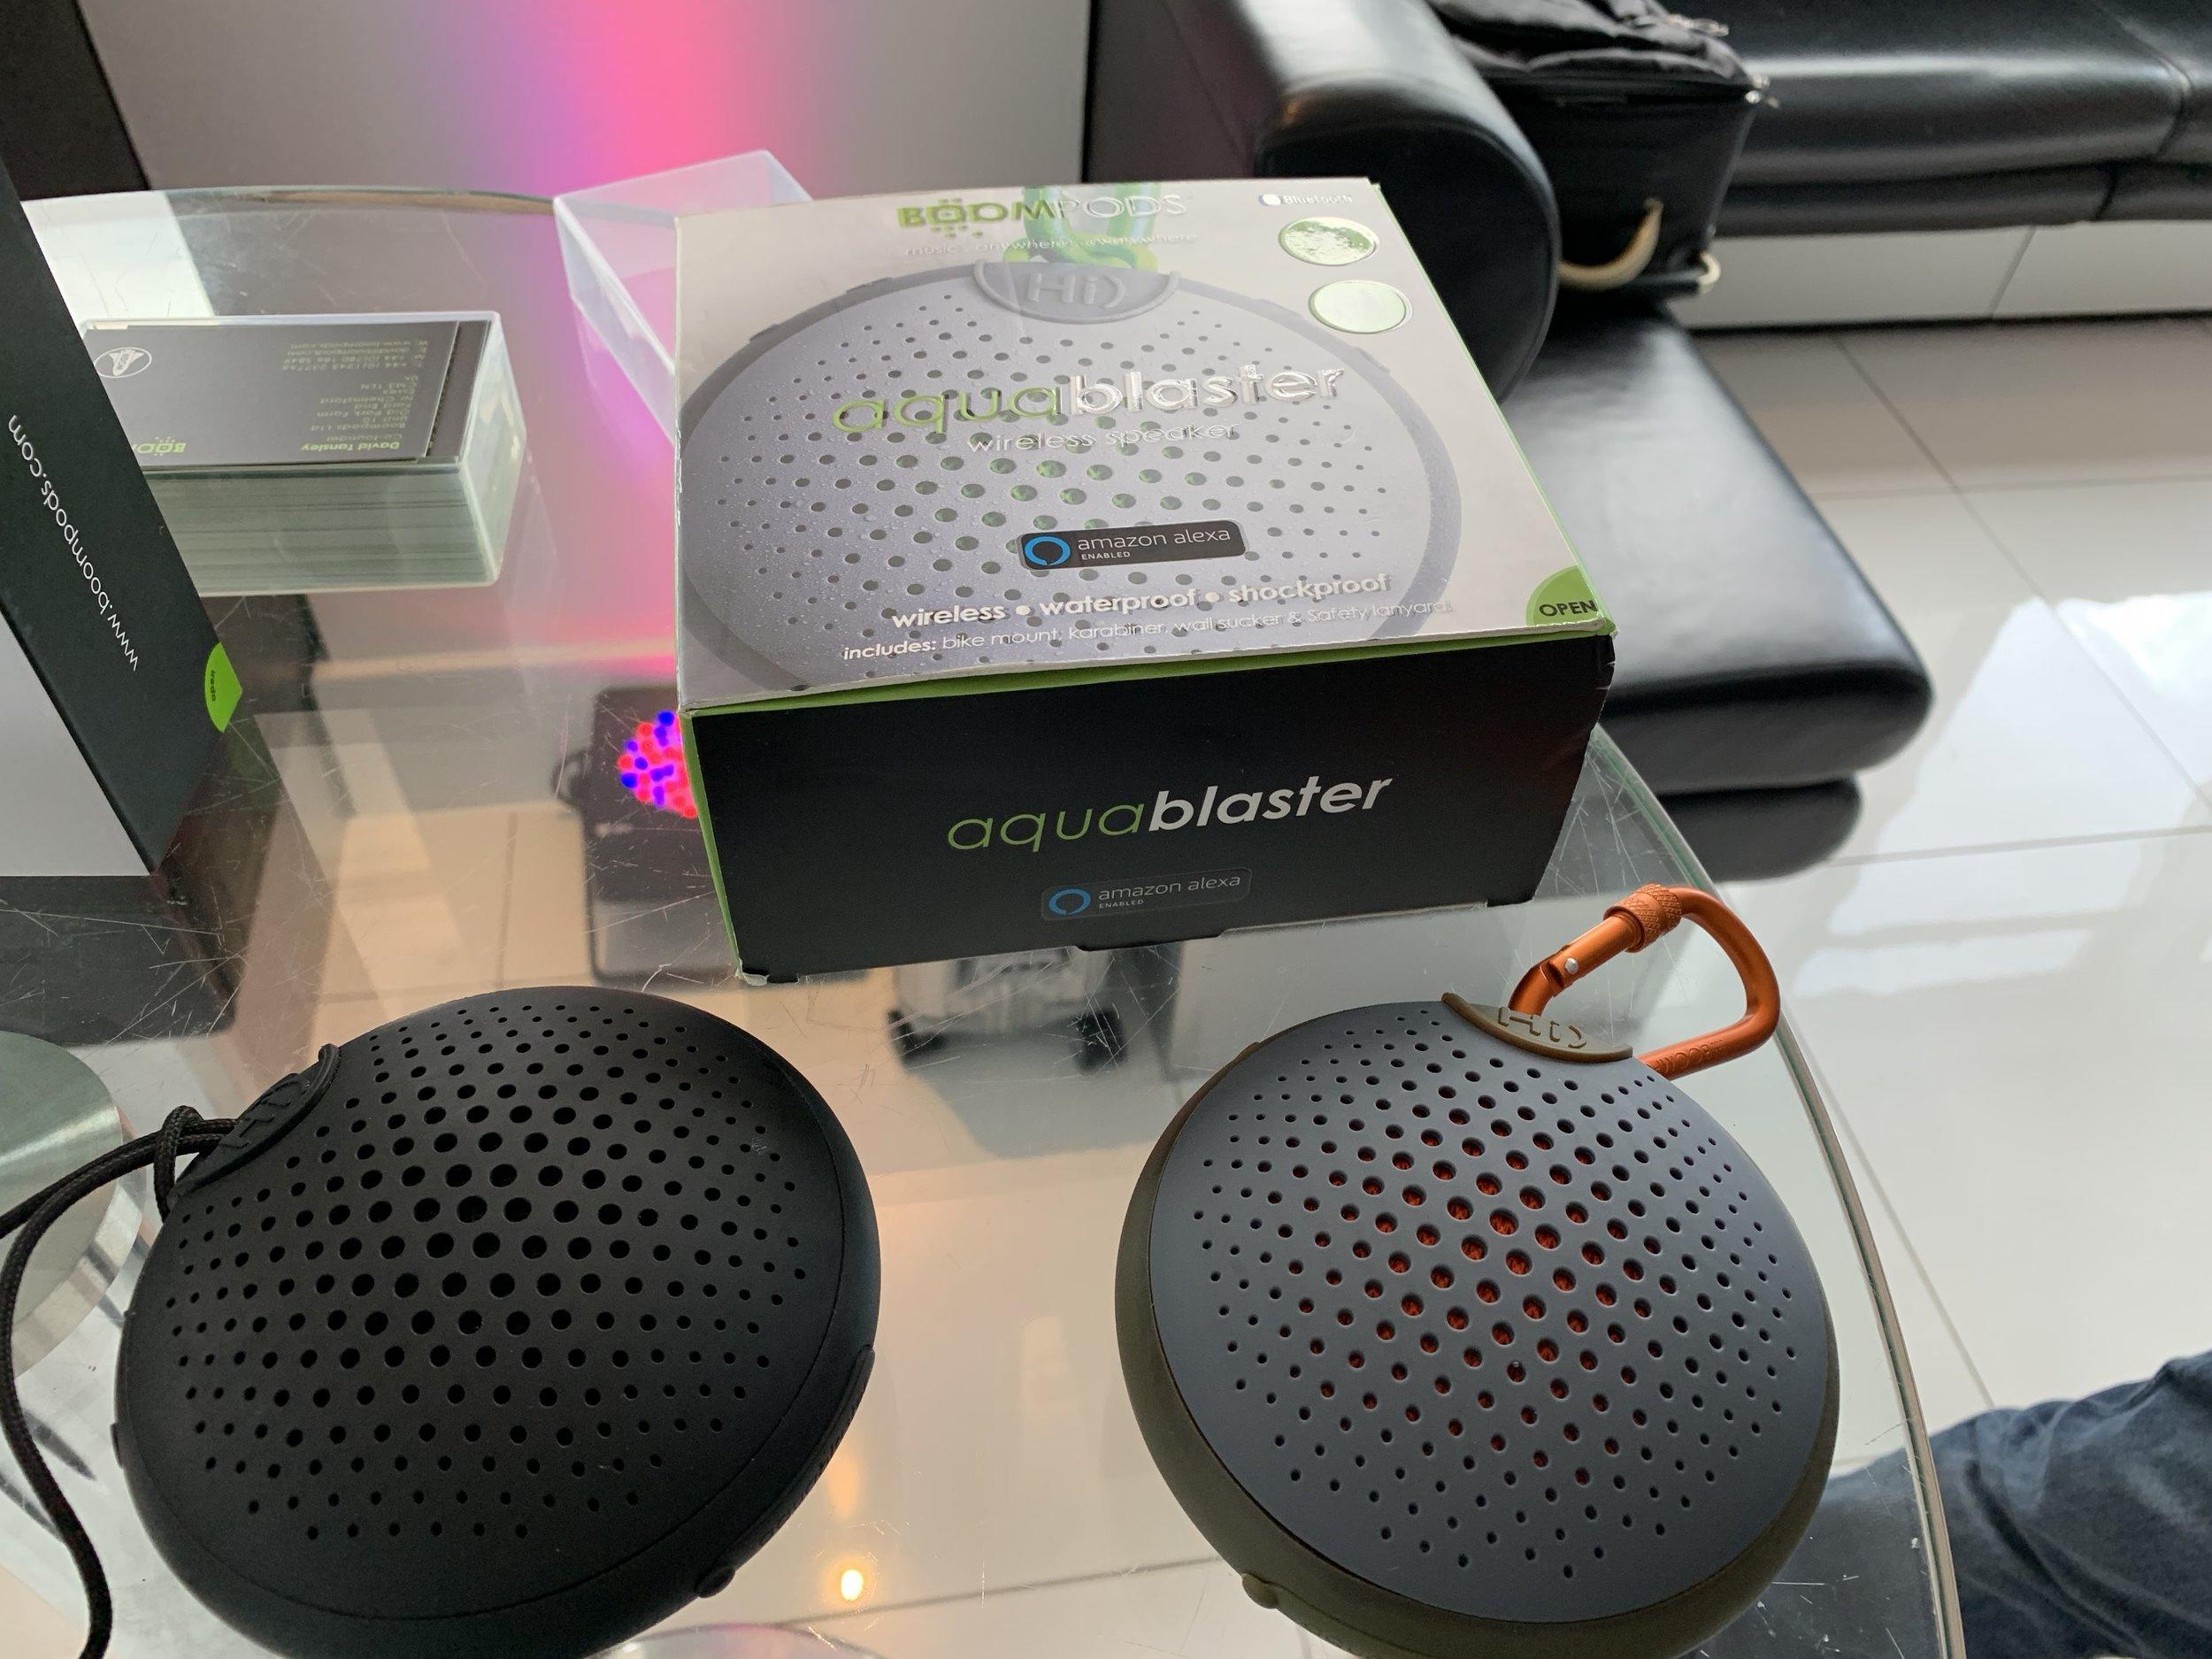 BoomPod's Aquablaster bluetooth speaker comes packed with Alexa